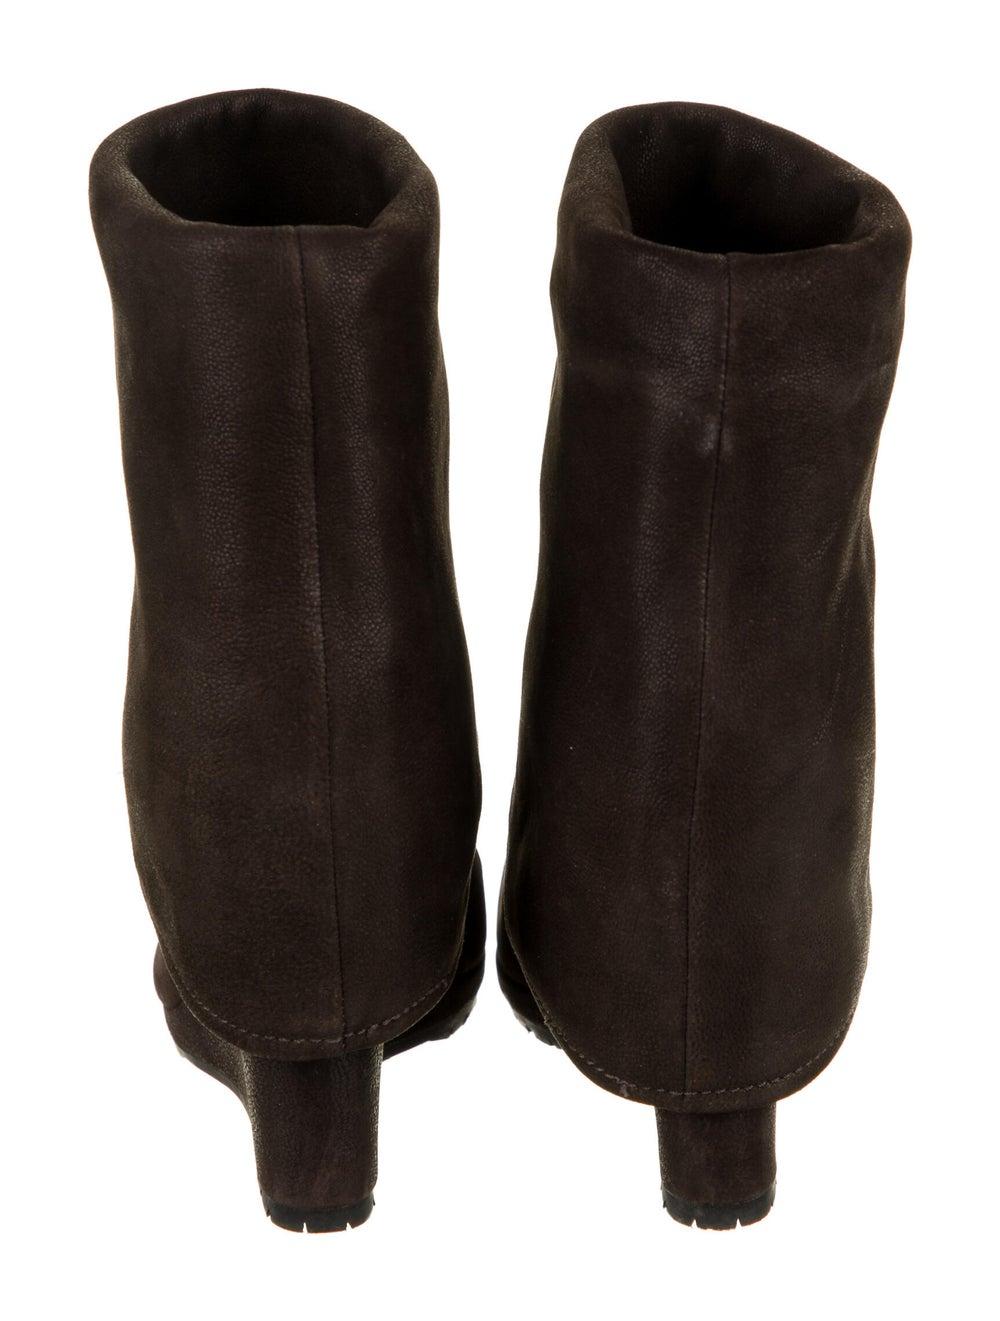 Prada Sport Suede Boots Brown - image 4